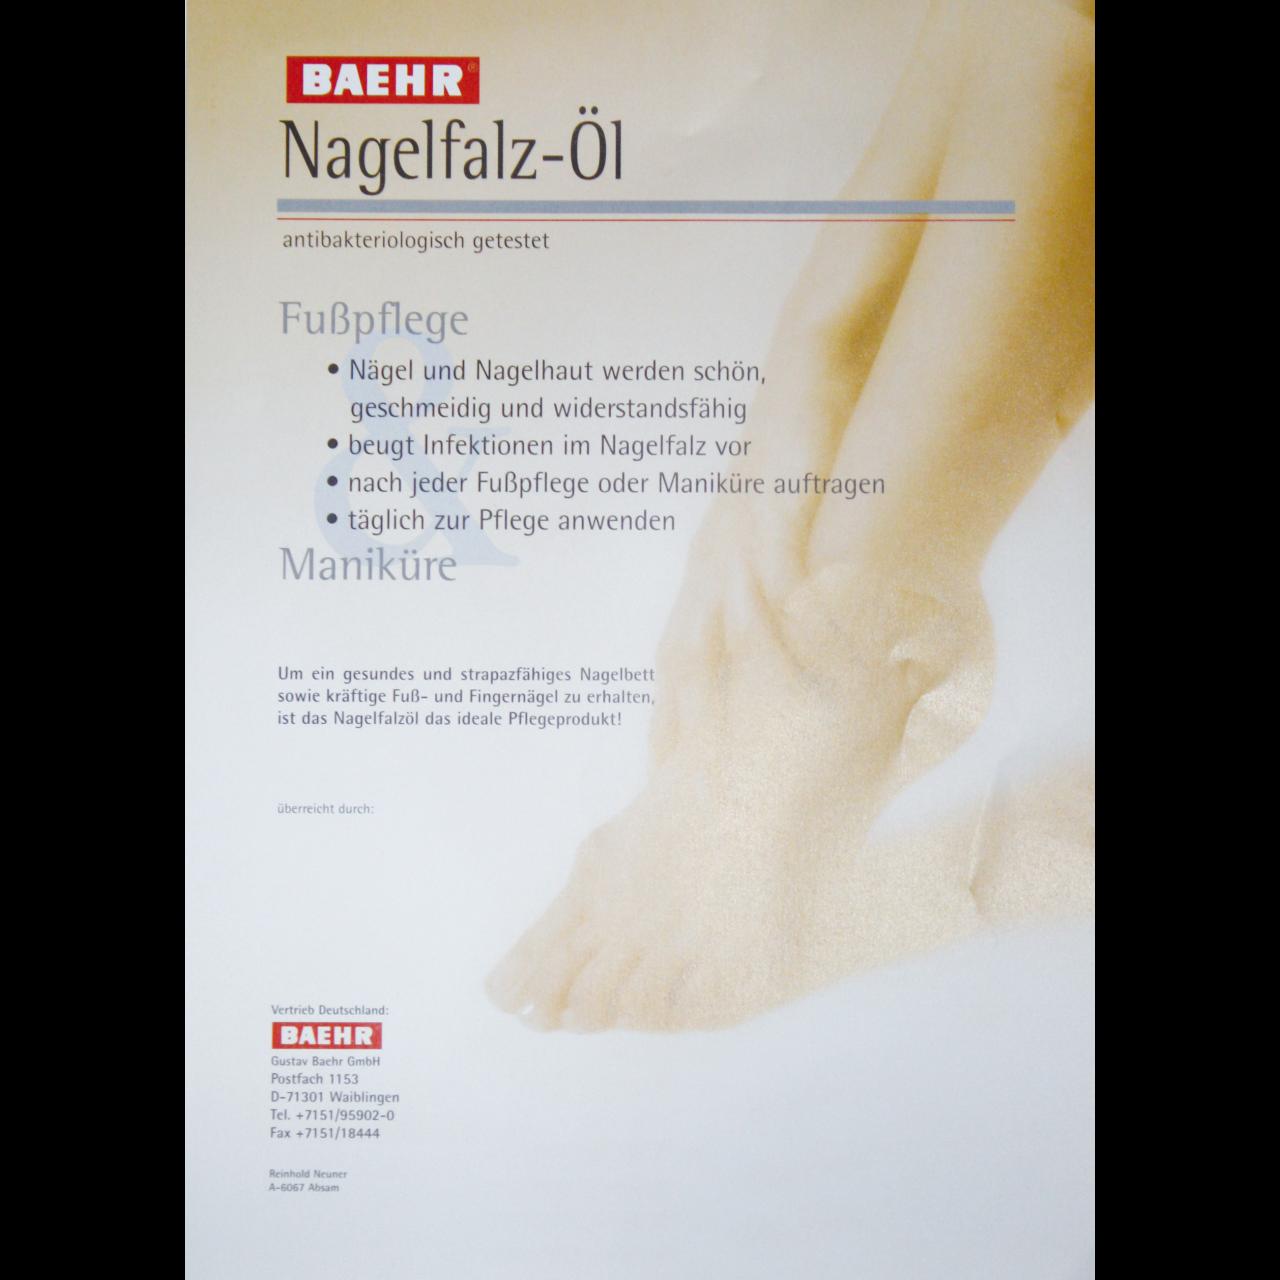 Flyer BAEHR-Nagelfalz-Öl DIN A4 1 Stk.